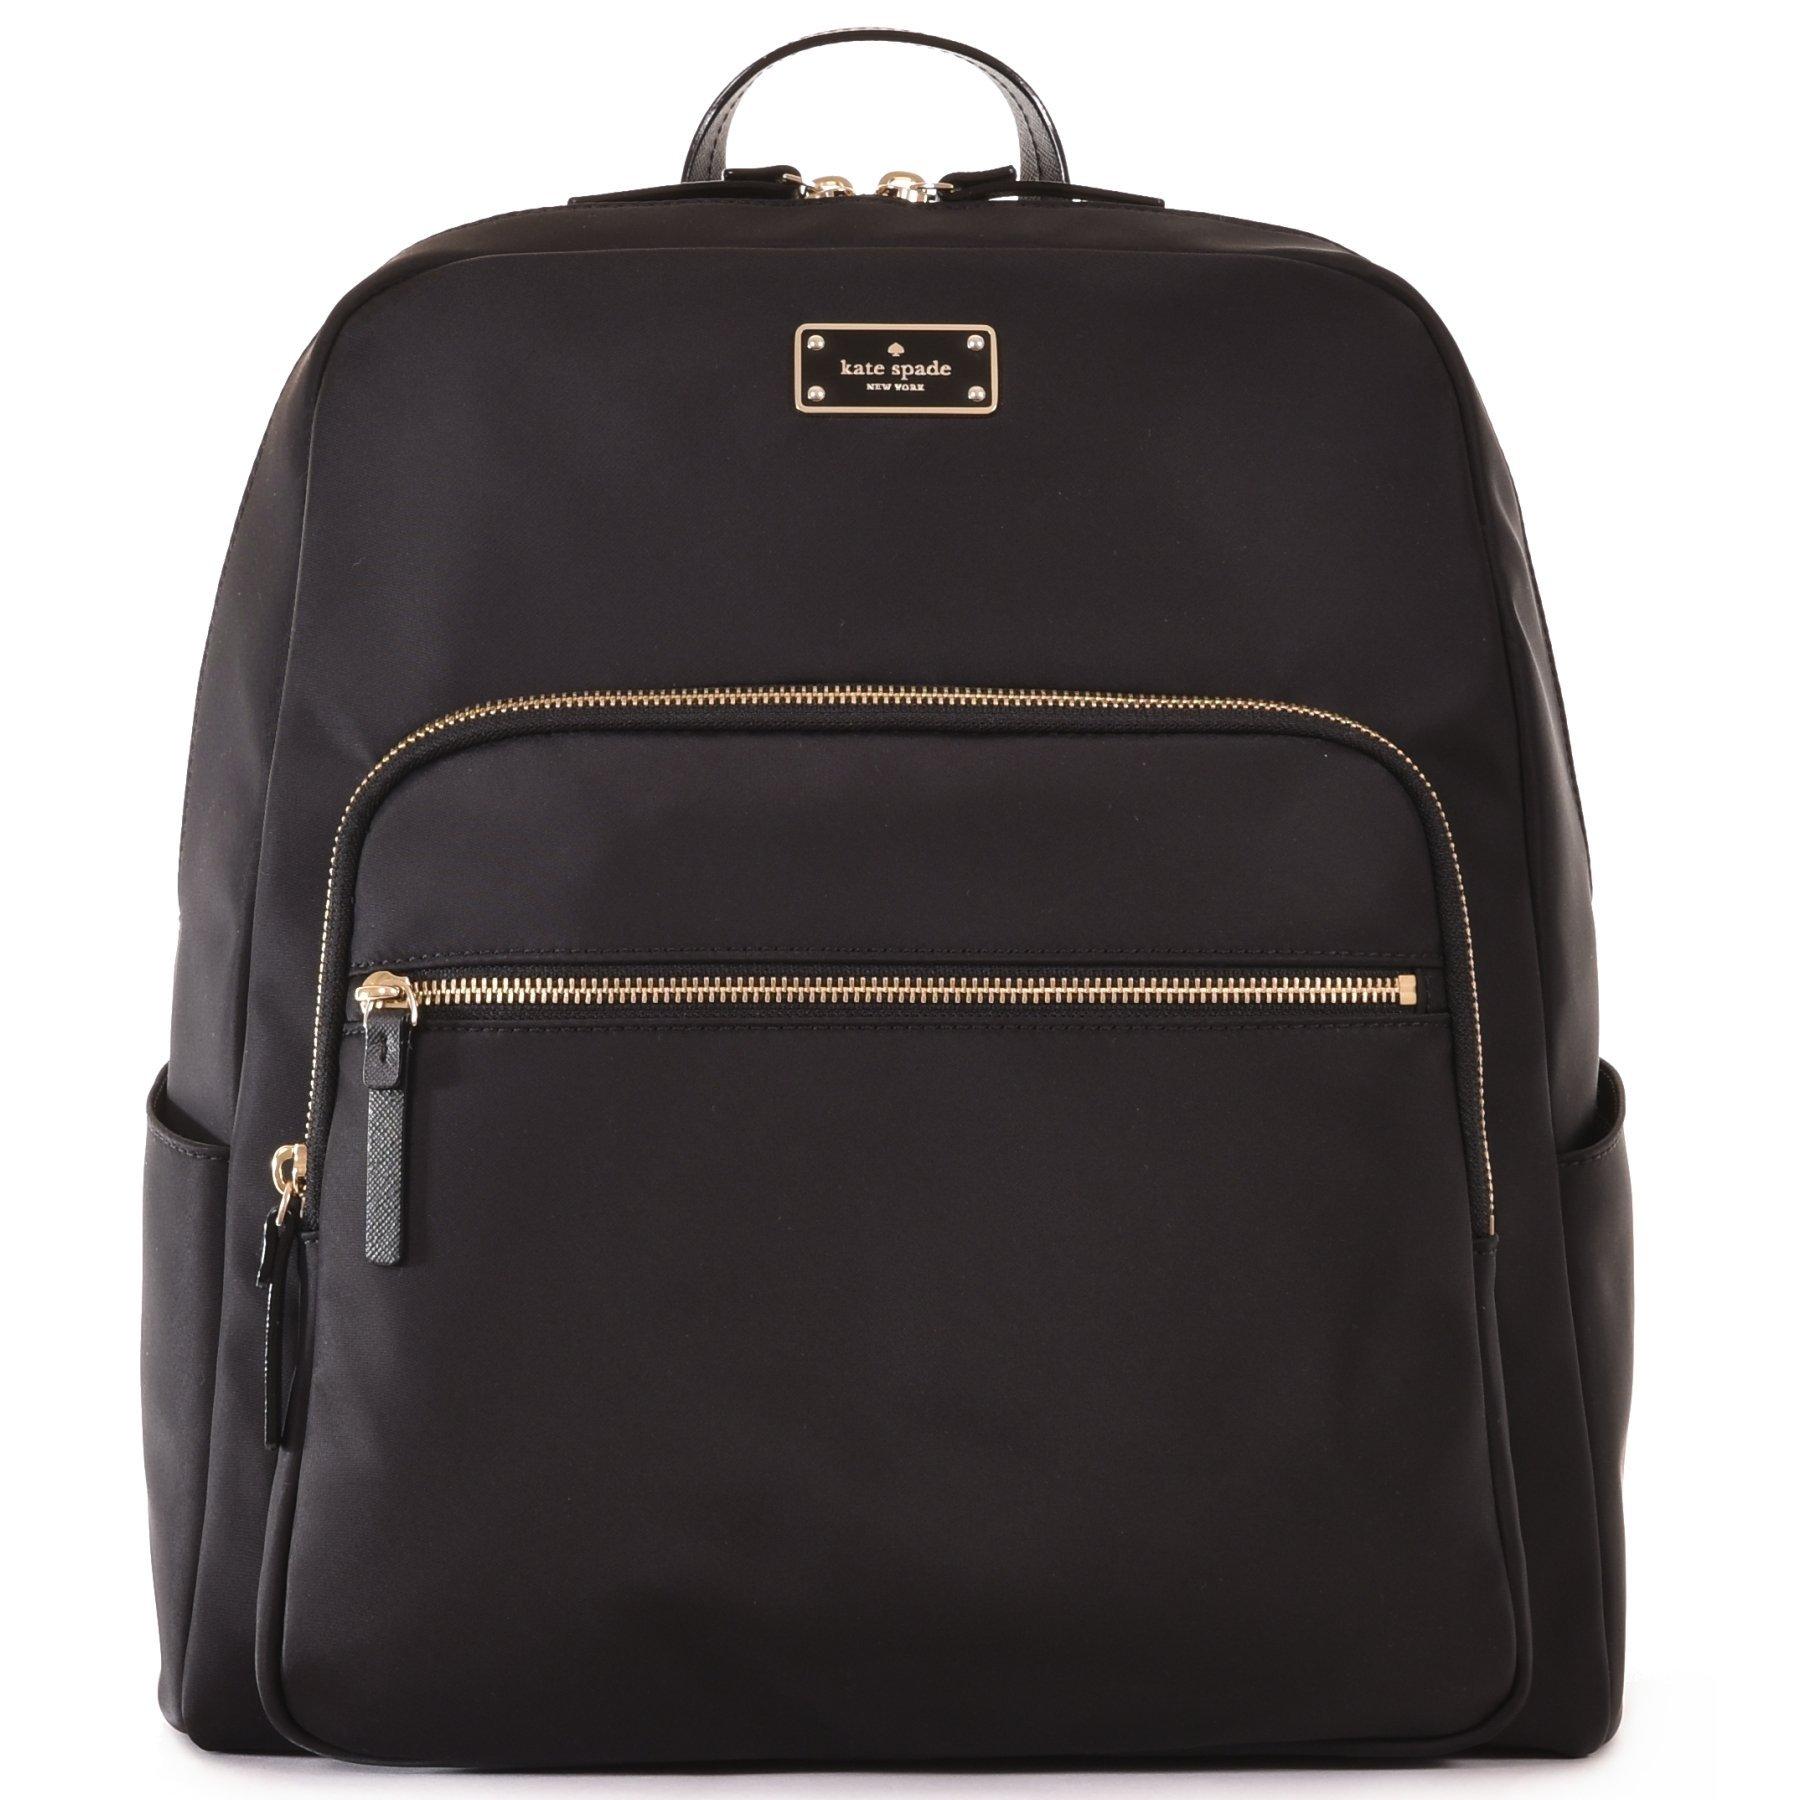 Kate Spade Large Hilo Blake Avenue Laptop Backpack - Black